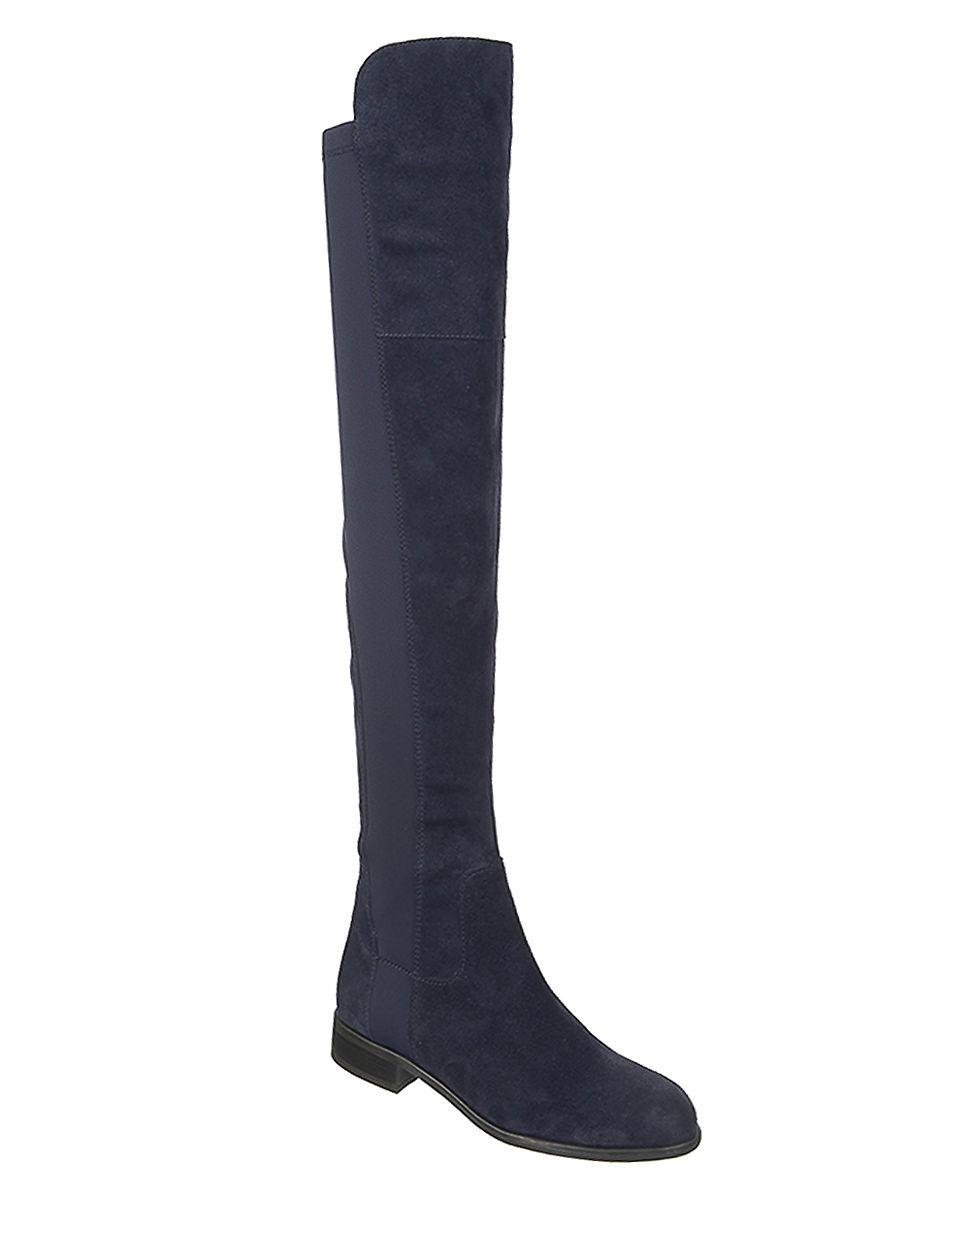 Franco sarto motor suede knee high boots in blue lyst for Franco sarto motor over the knee boots